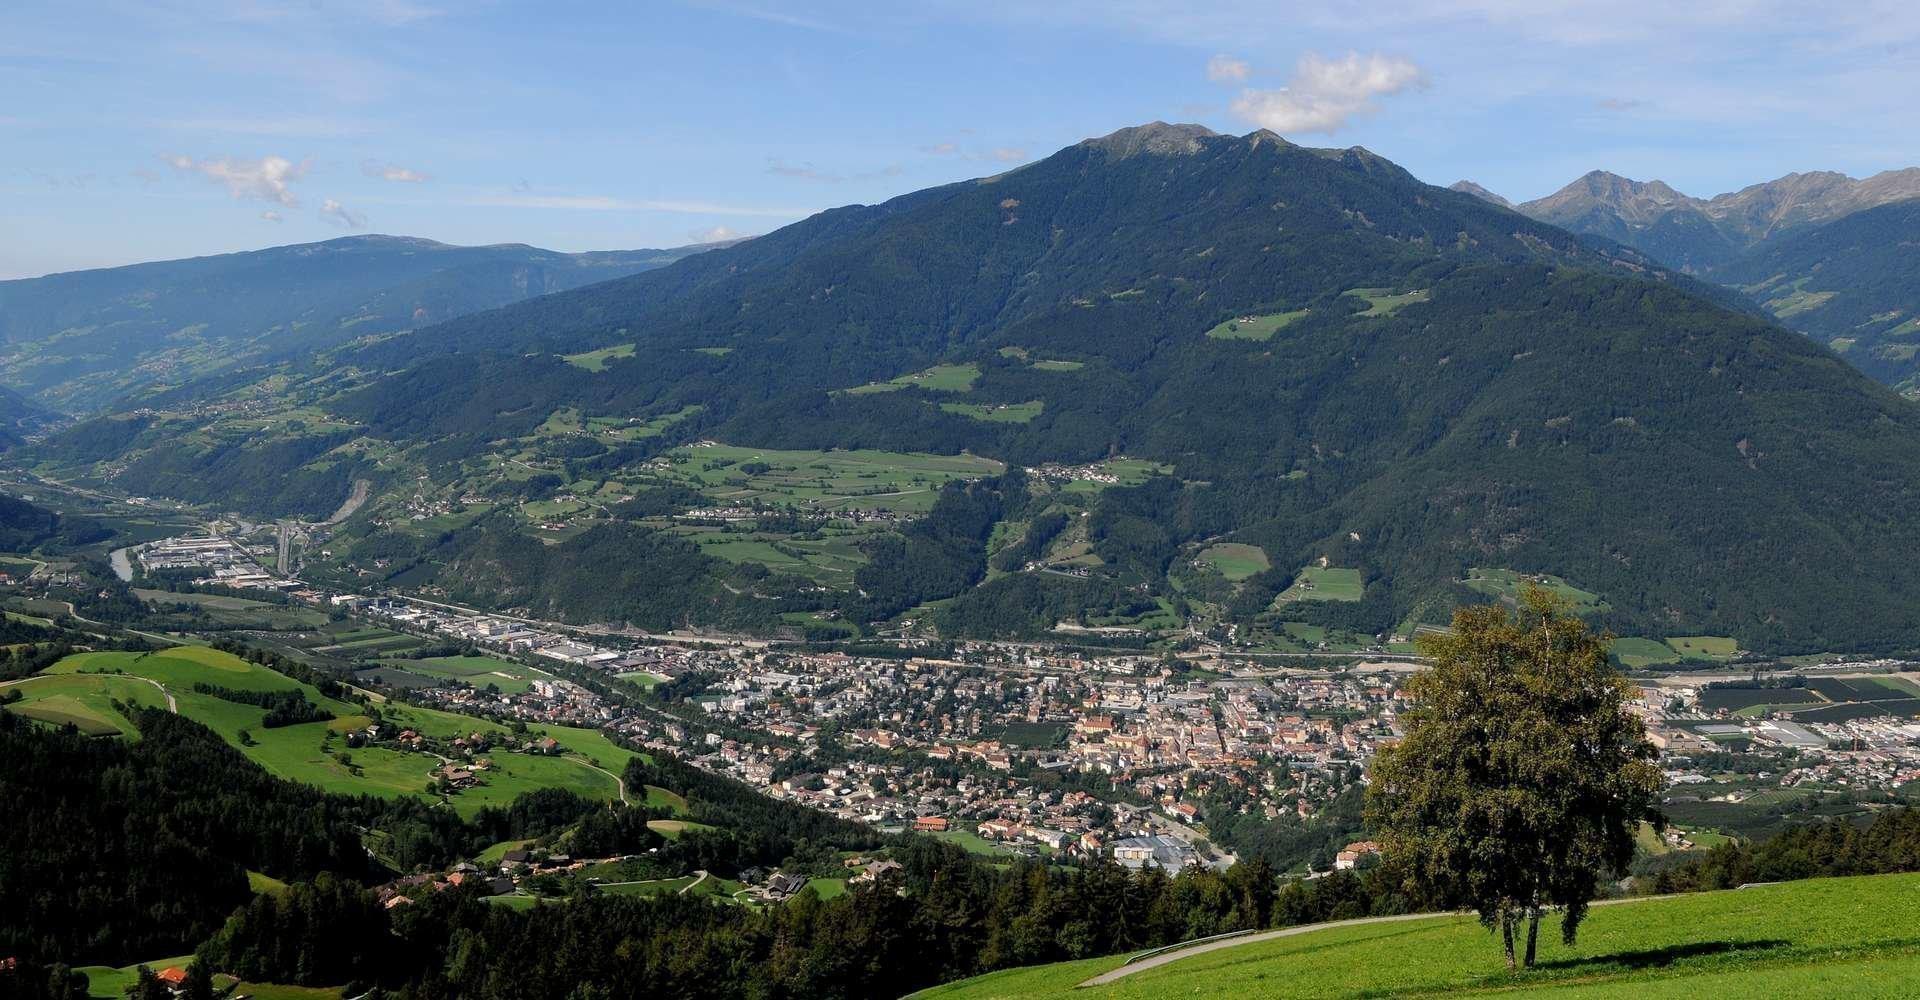 wanderurlaub-brixen-suedtirol